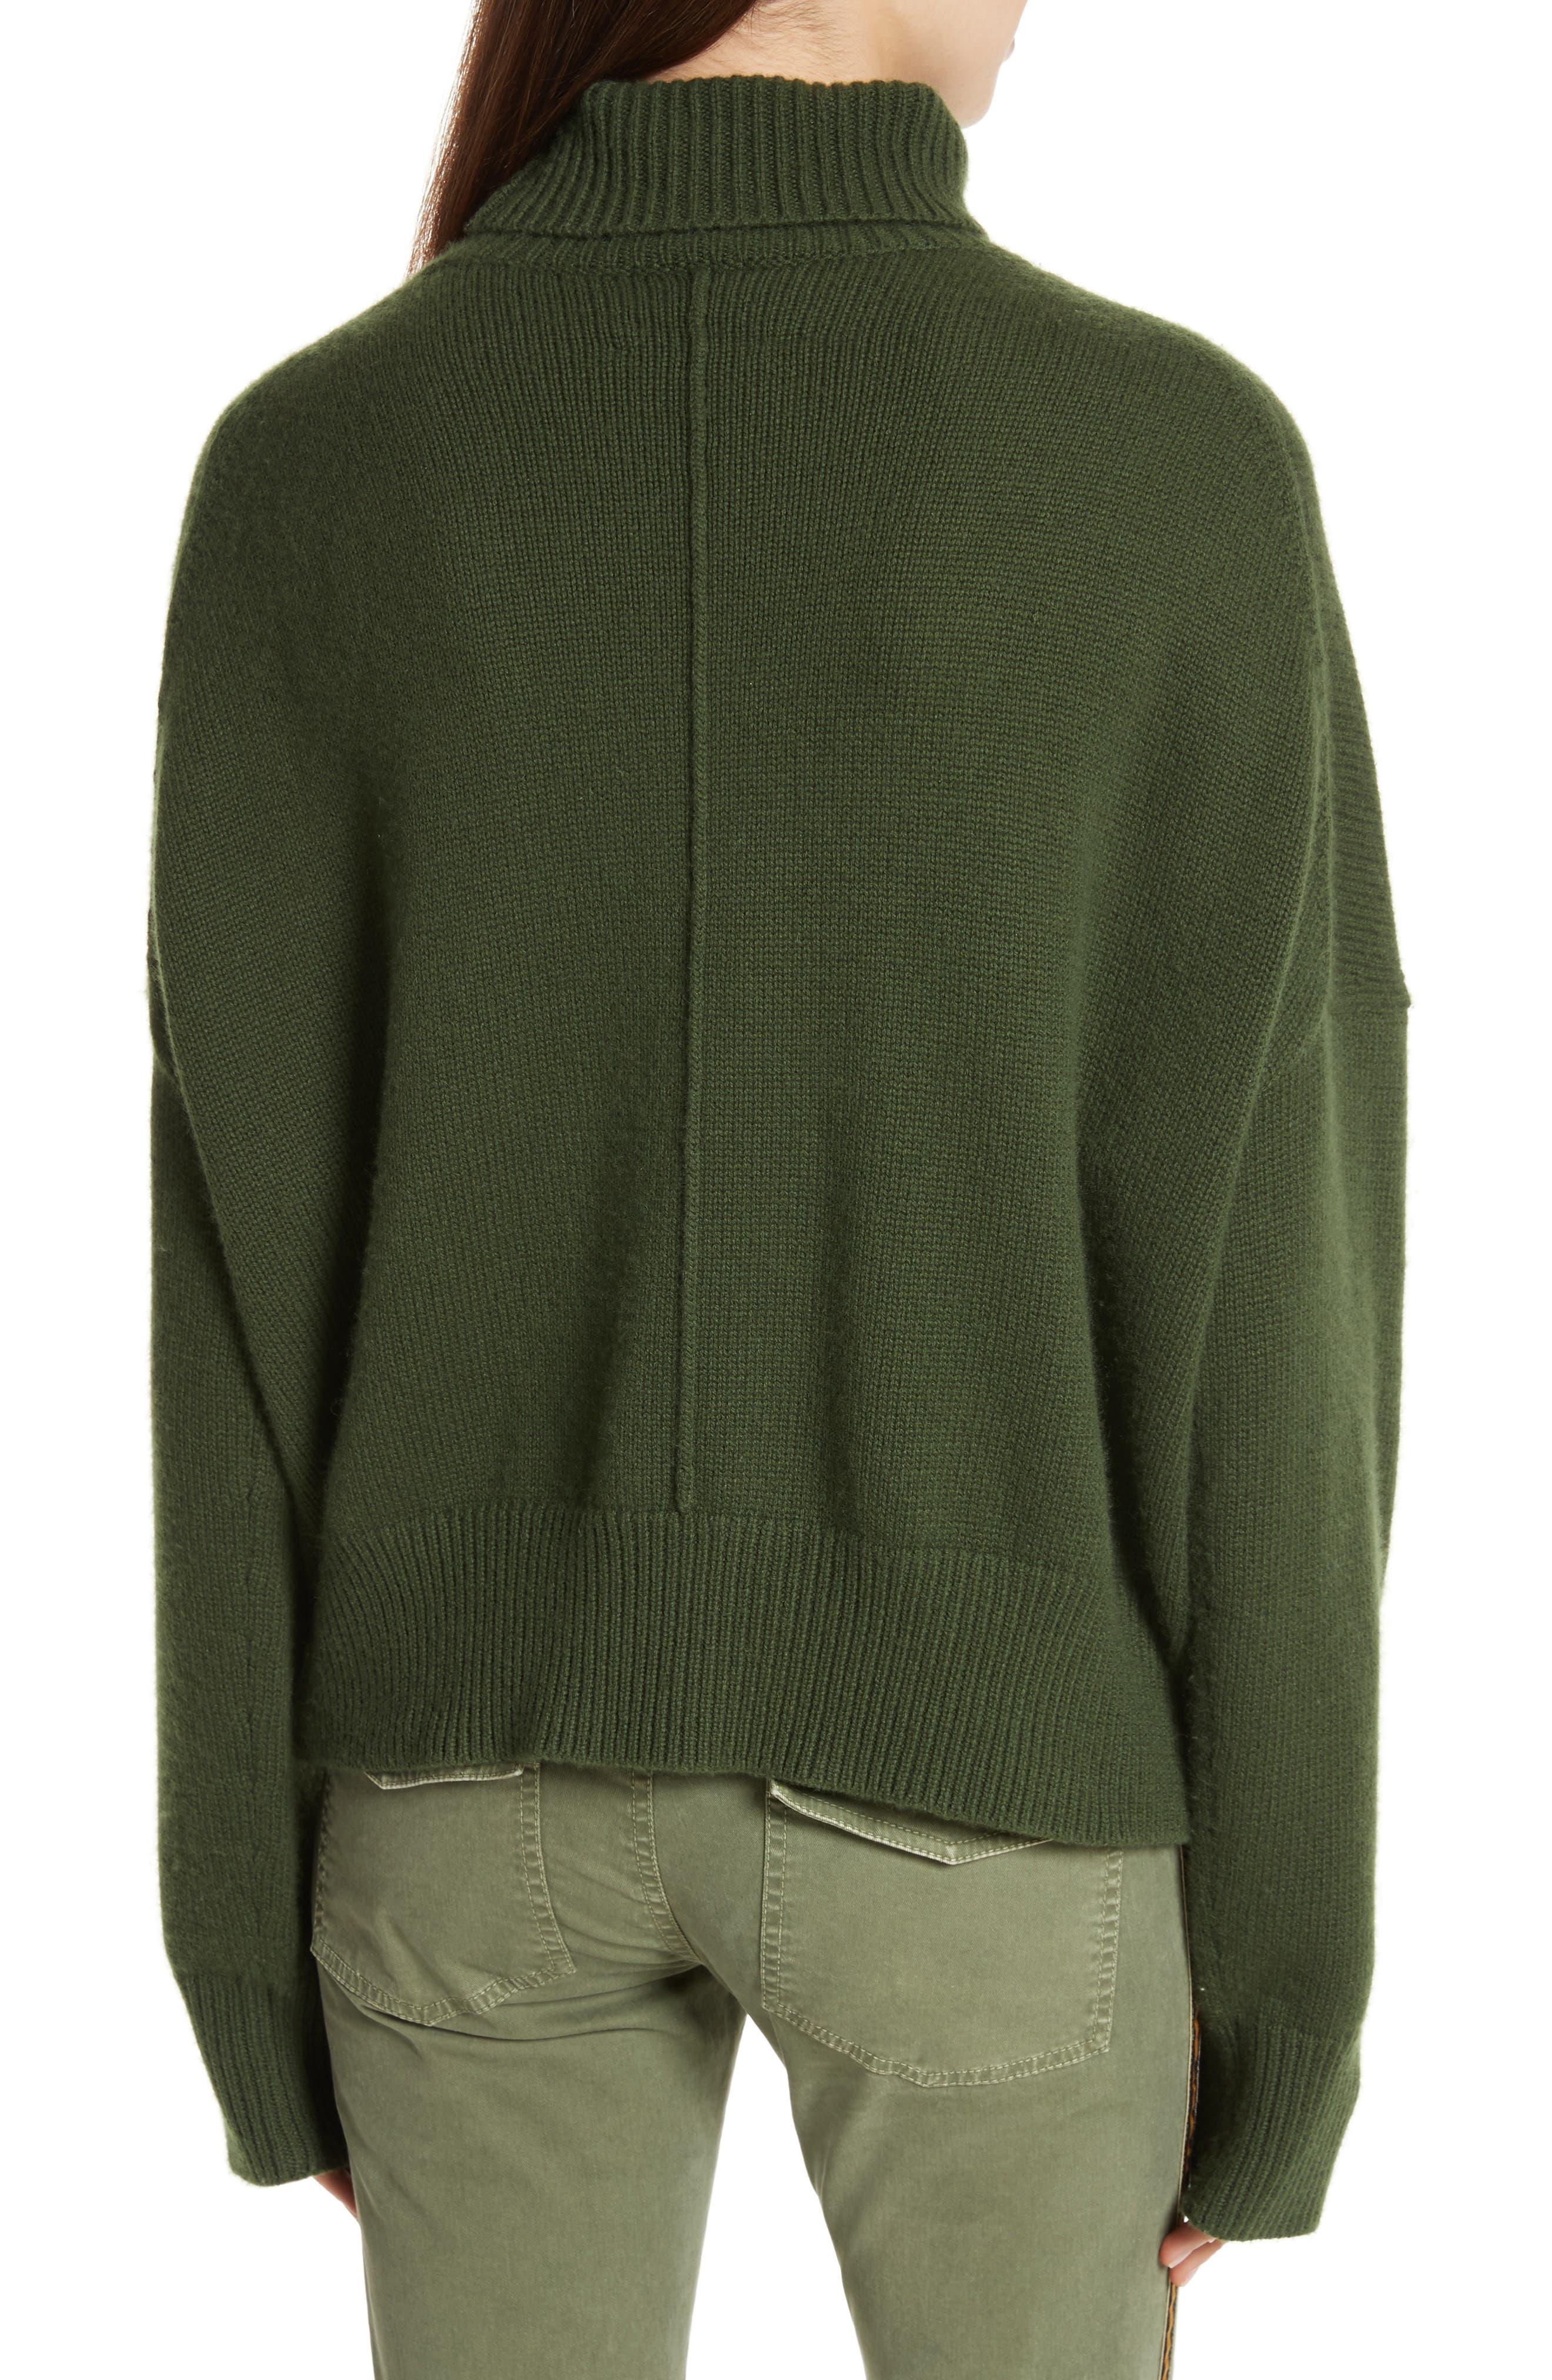 Serinda Wool & Cashmere Turtleneck Sweater,                             Alternate thumbnail 2, color,                             303